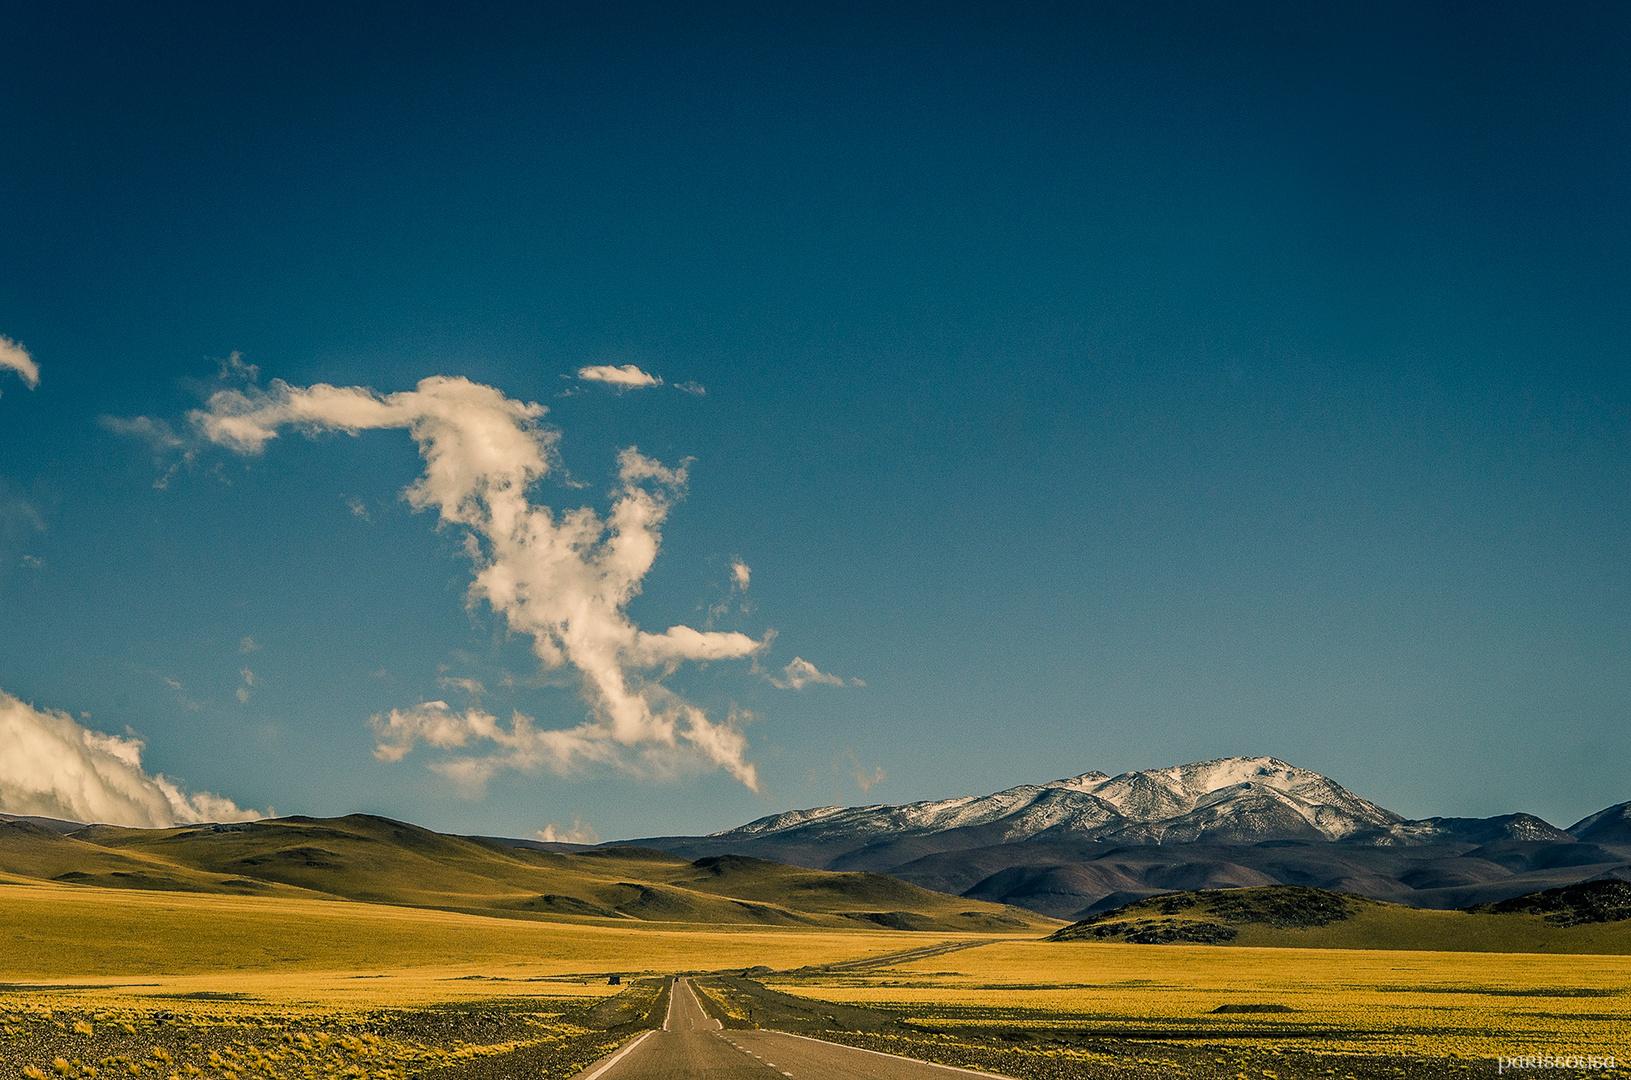 La nube corredora